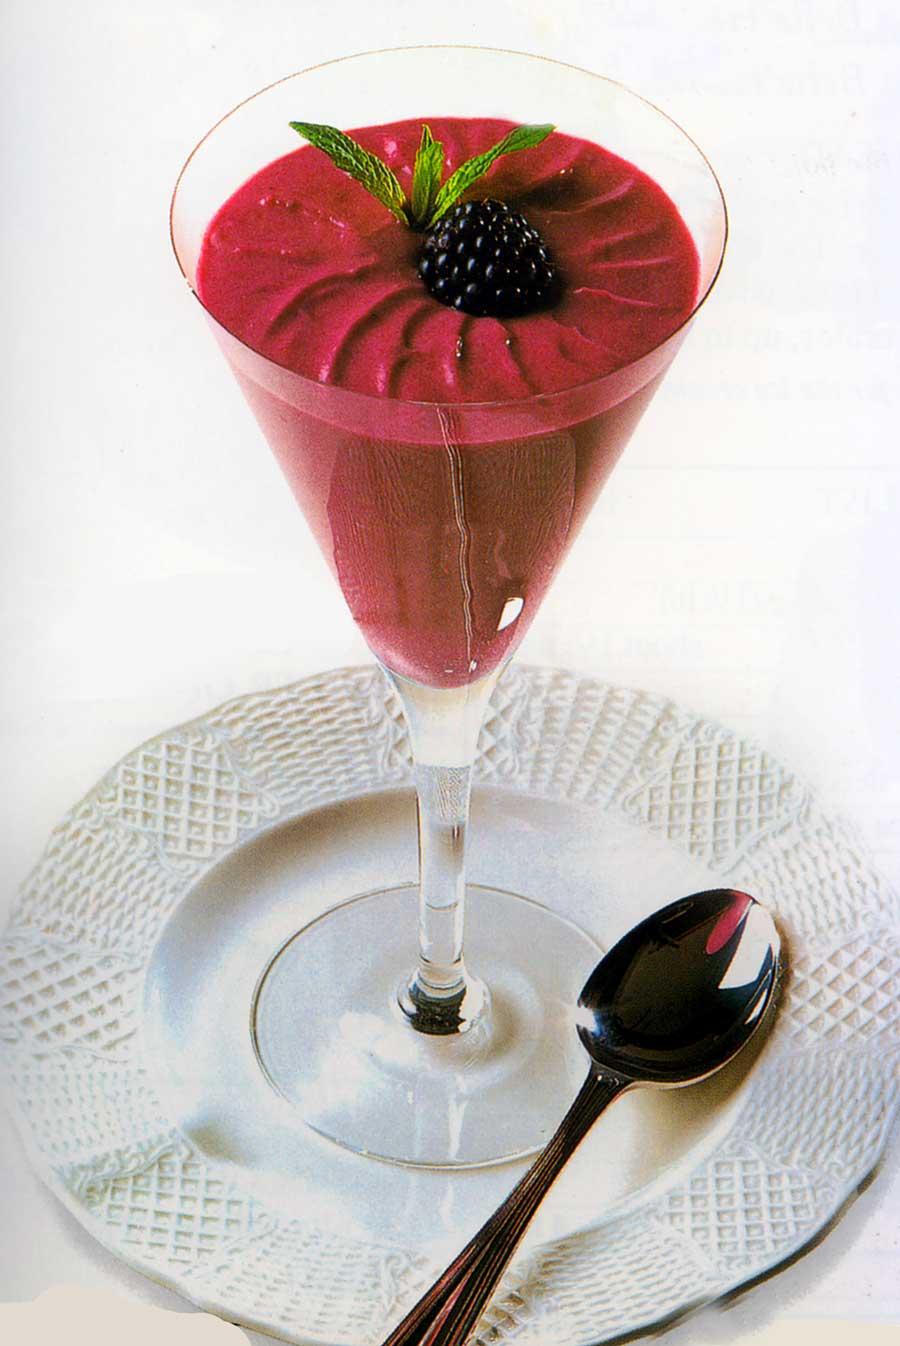 Blackberry-Fool-Recipe-easy-desserts-homemade-calories-nutrition